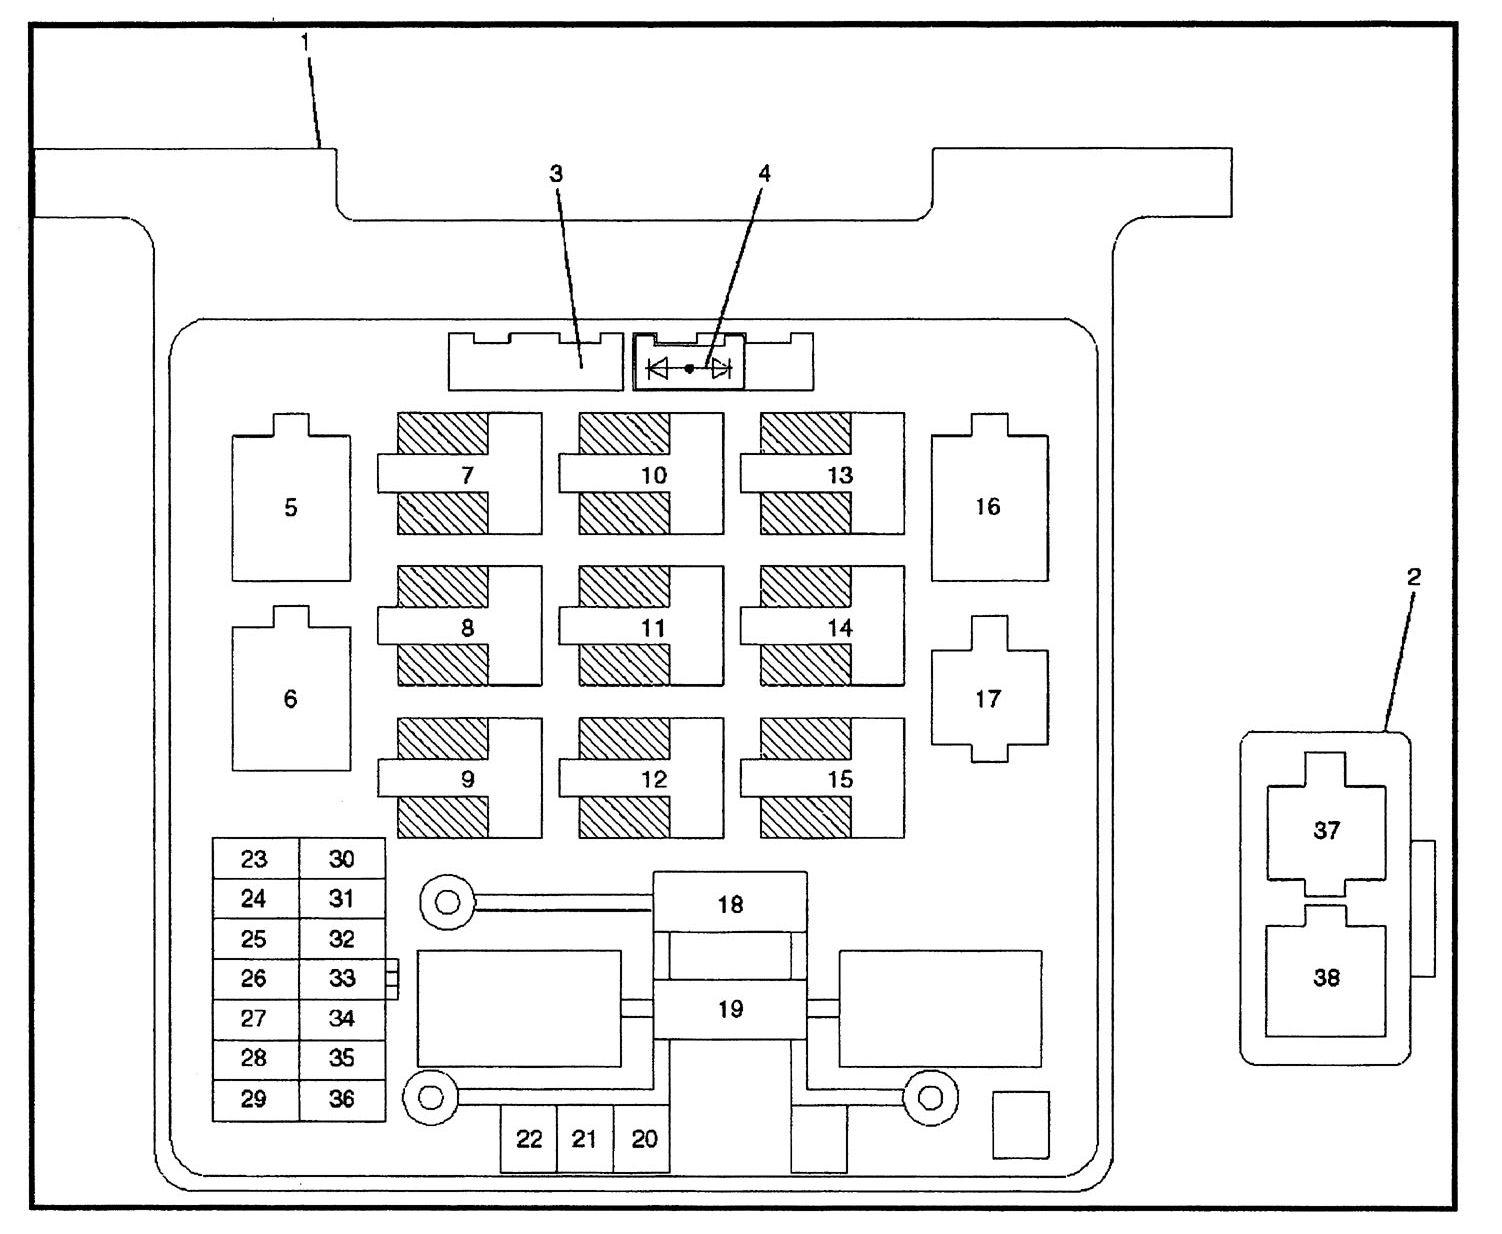 hight resolution of isuzu rodeo 2000 2001 fuse box diagram